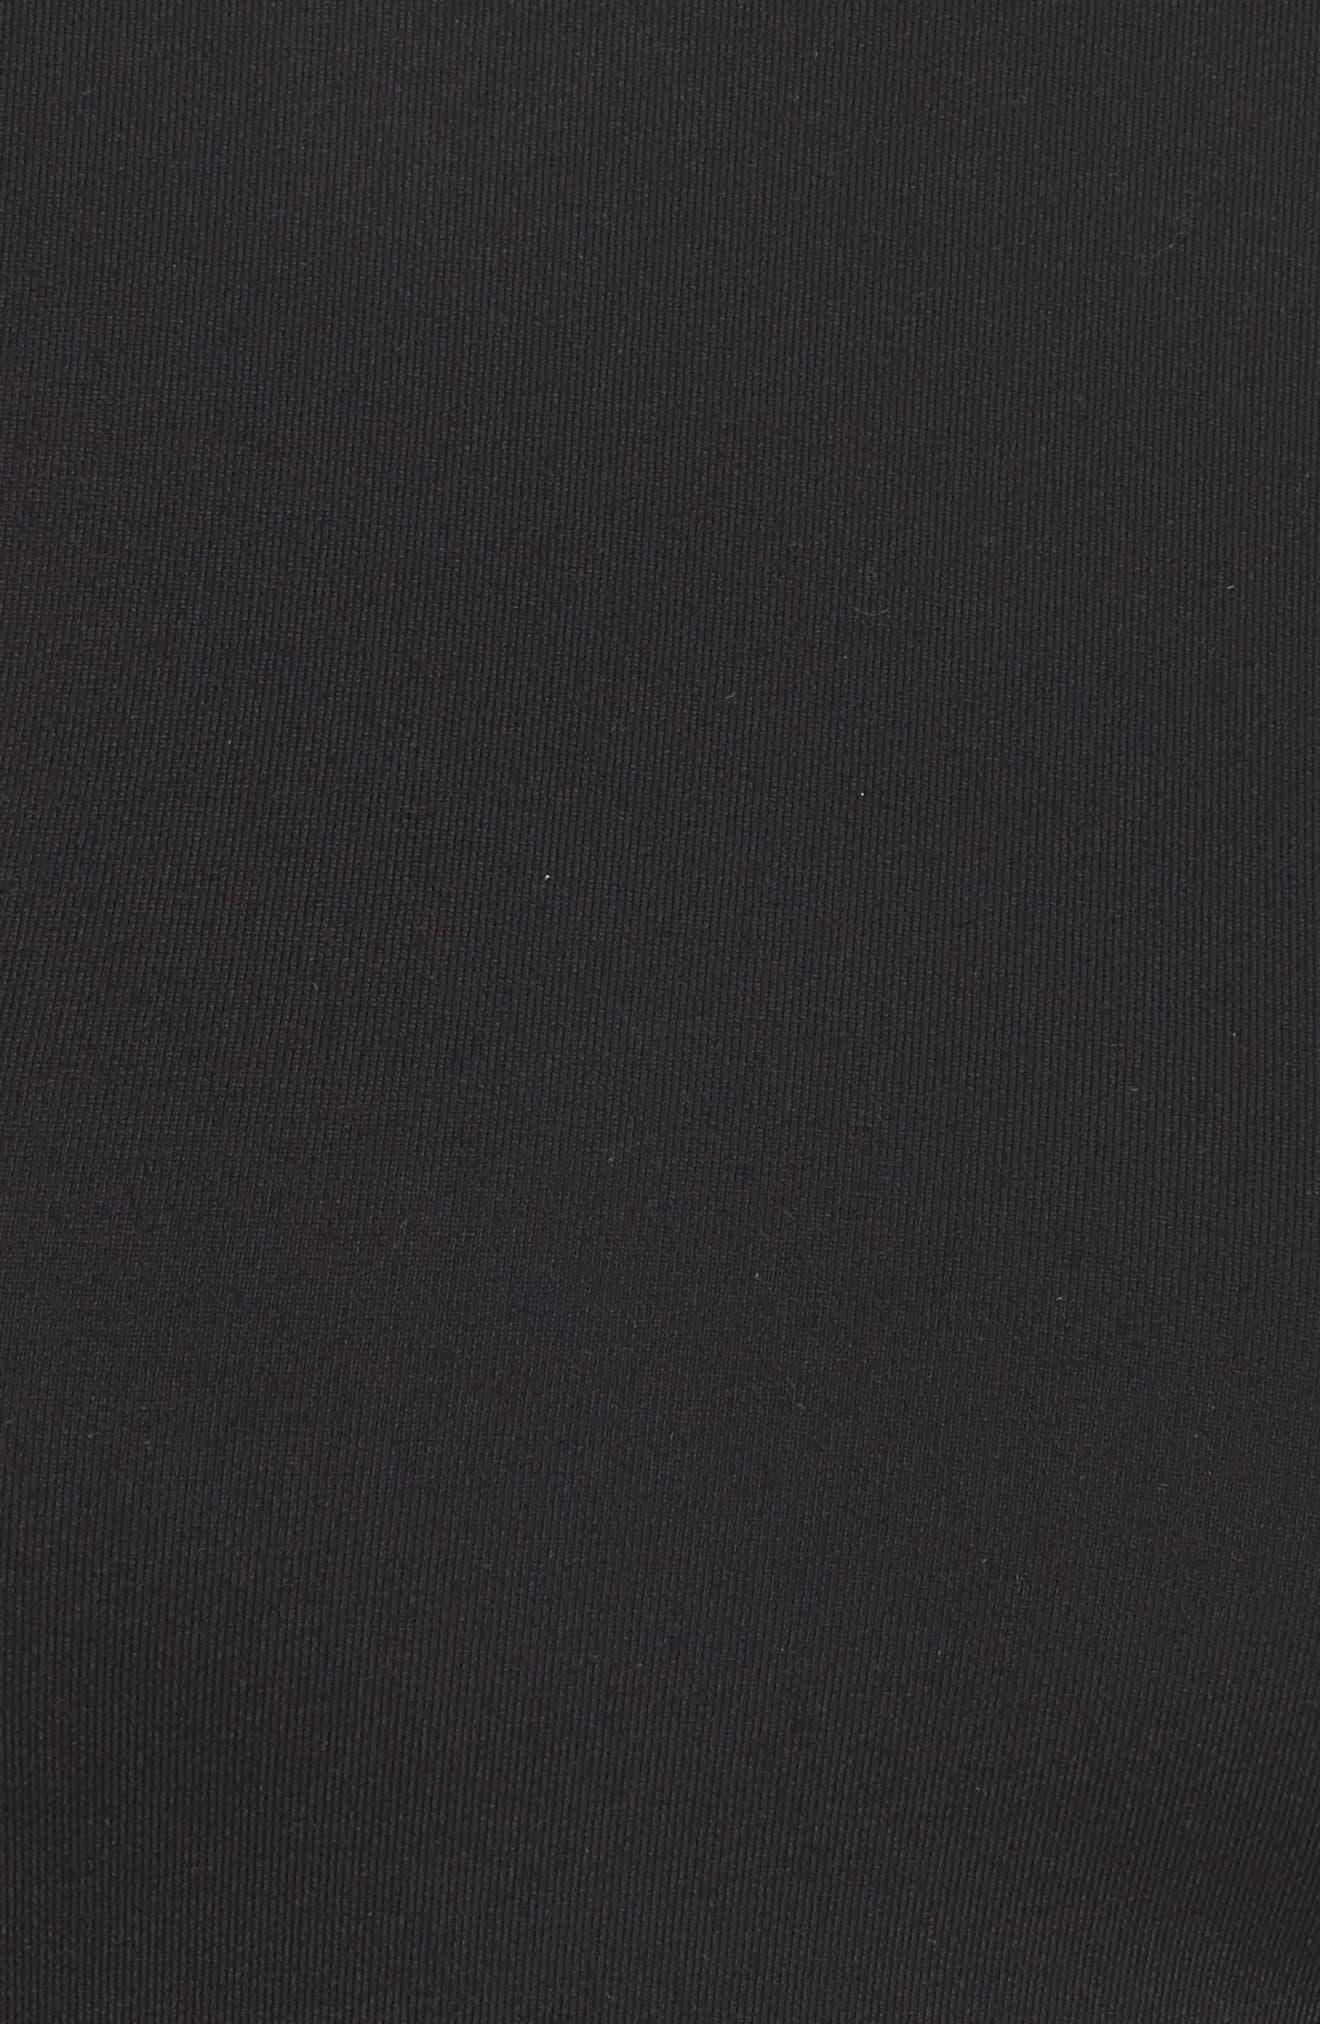 Tribe Long Sleeve Top,                             Alternate thumbnail 6, color,                             001